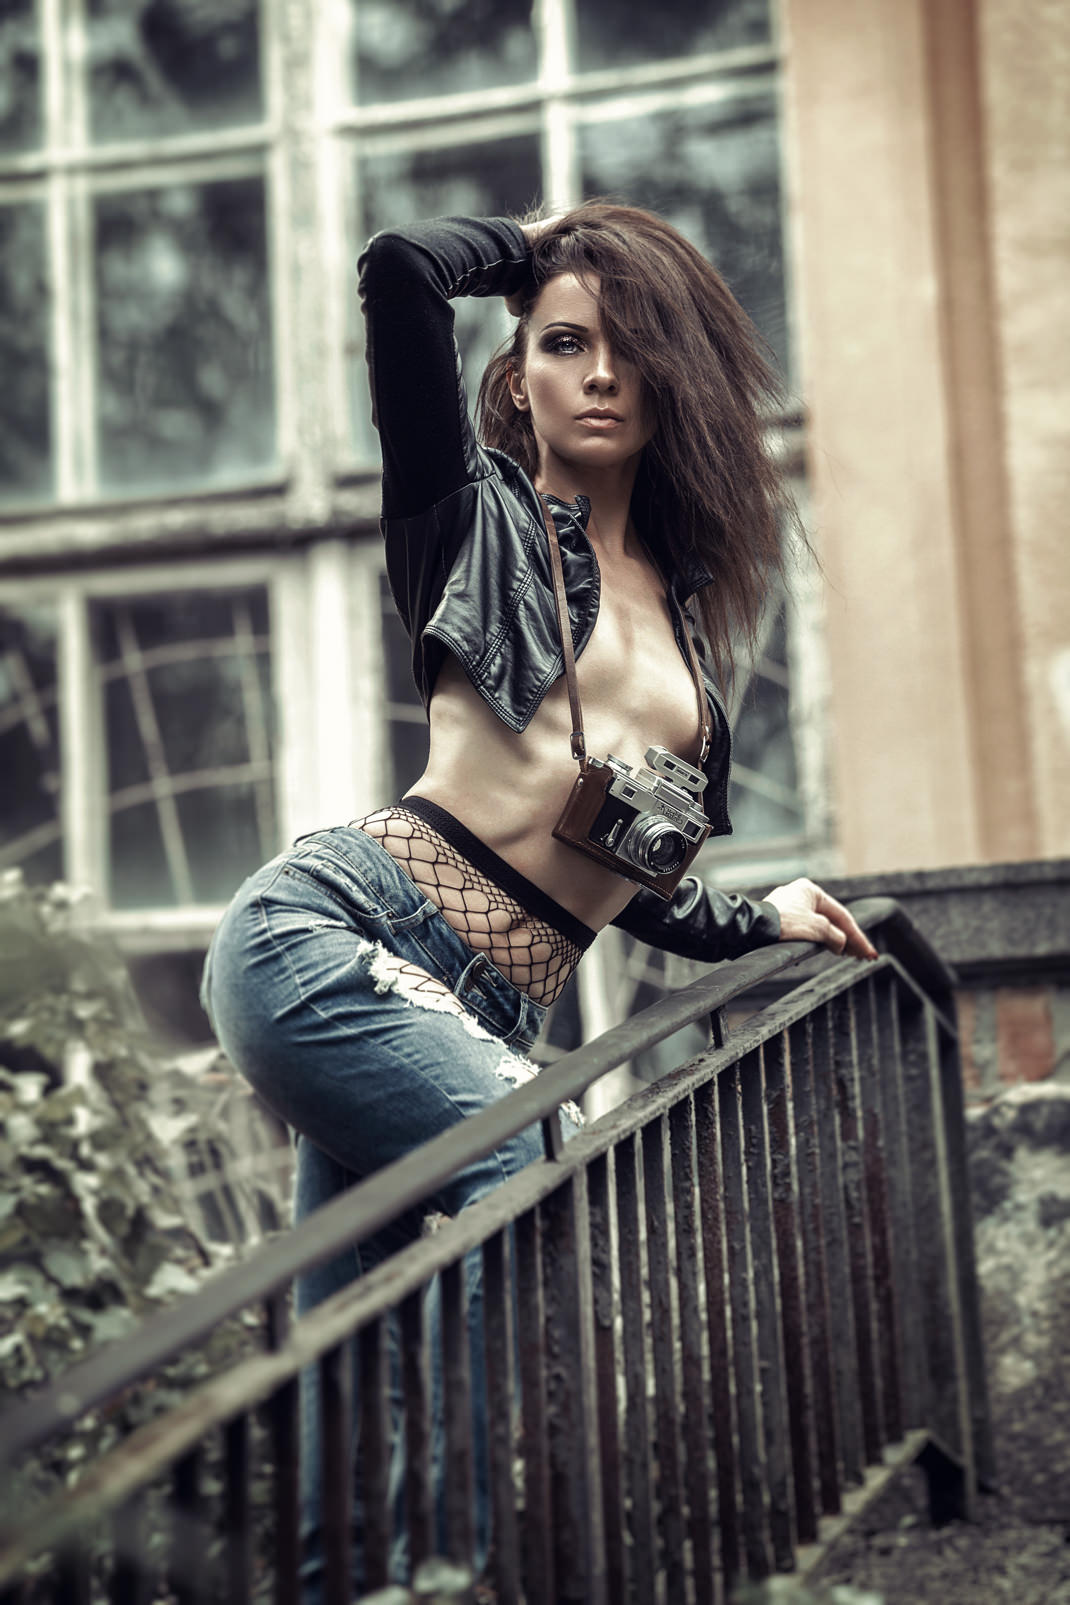 Two Beauties - Angélique & Kiev IV - Markus Hertzsch - Camera - Girl